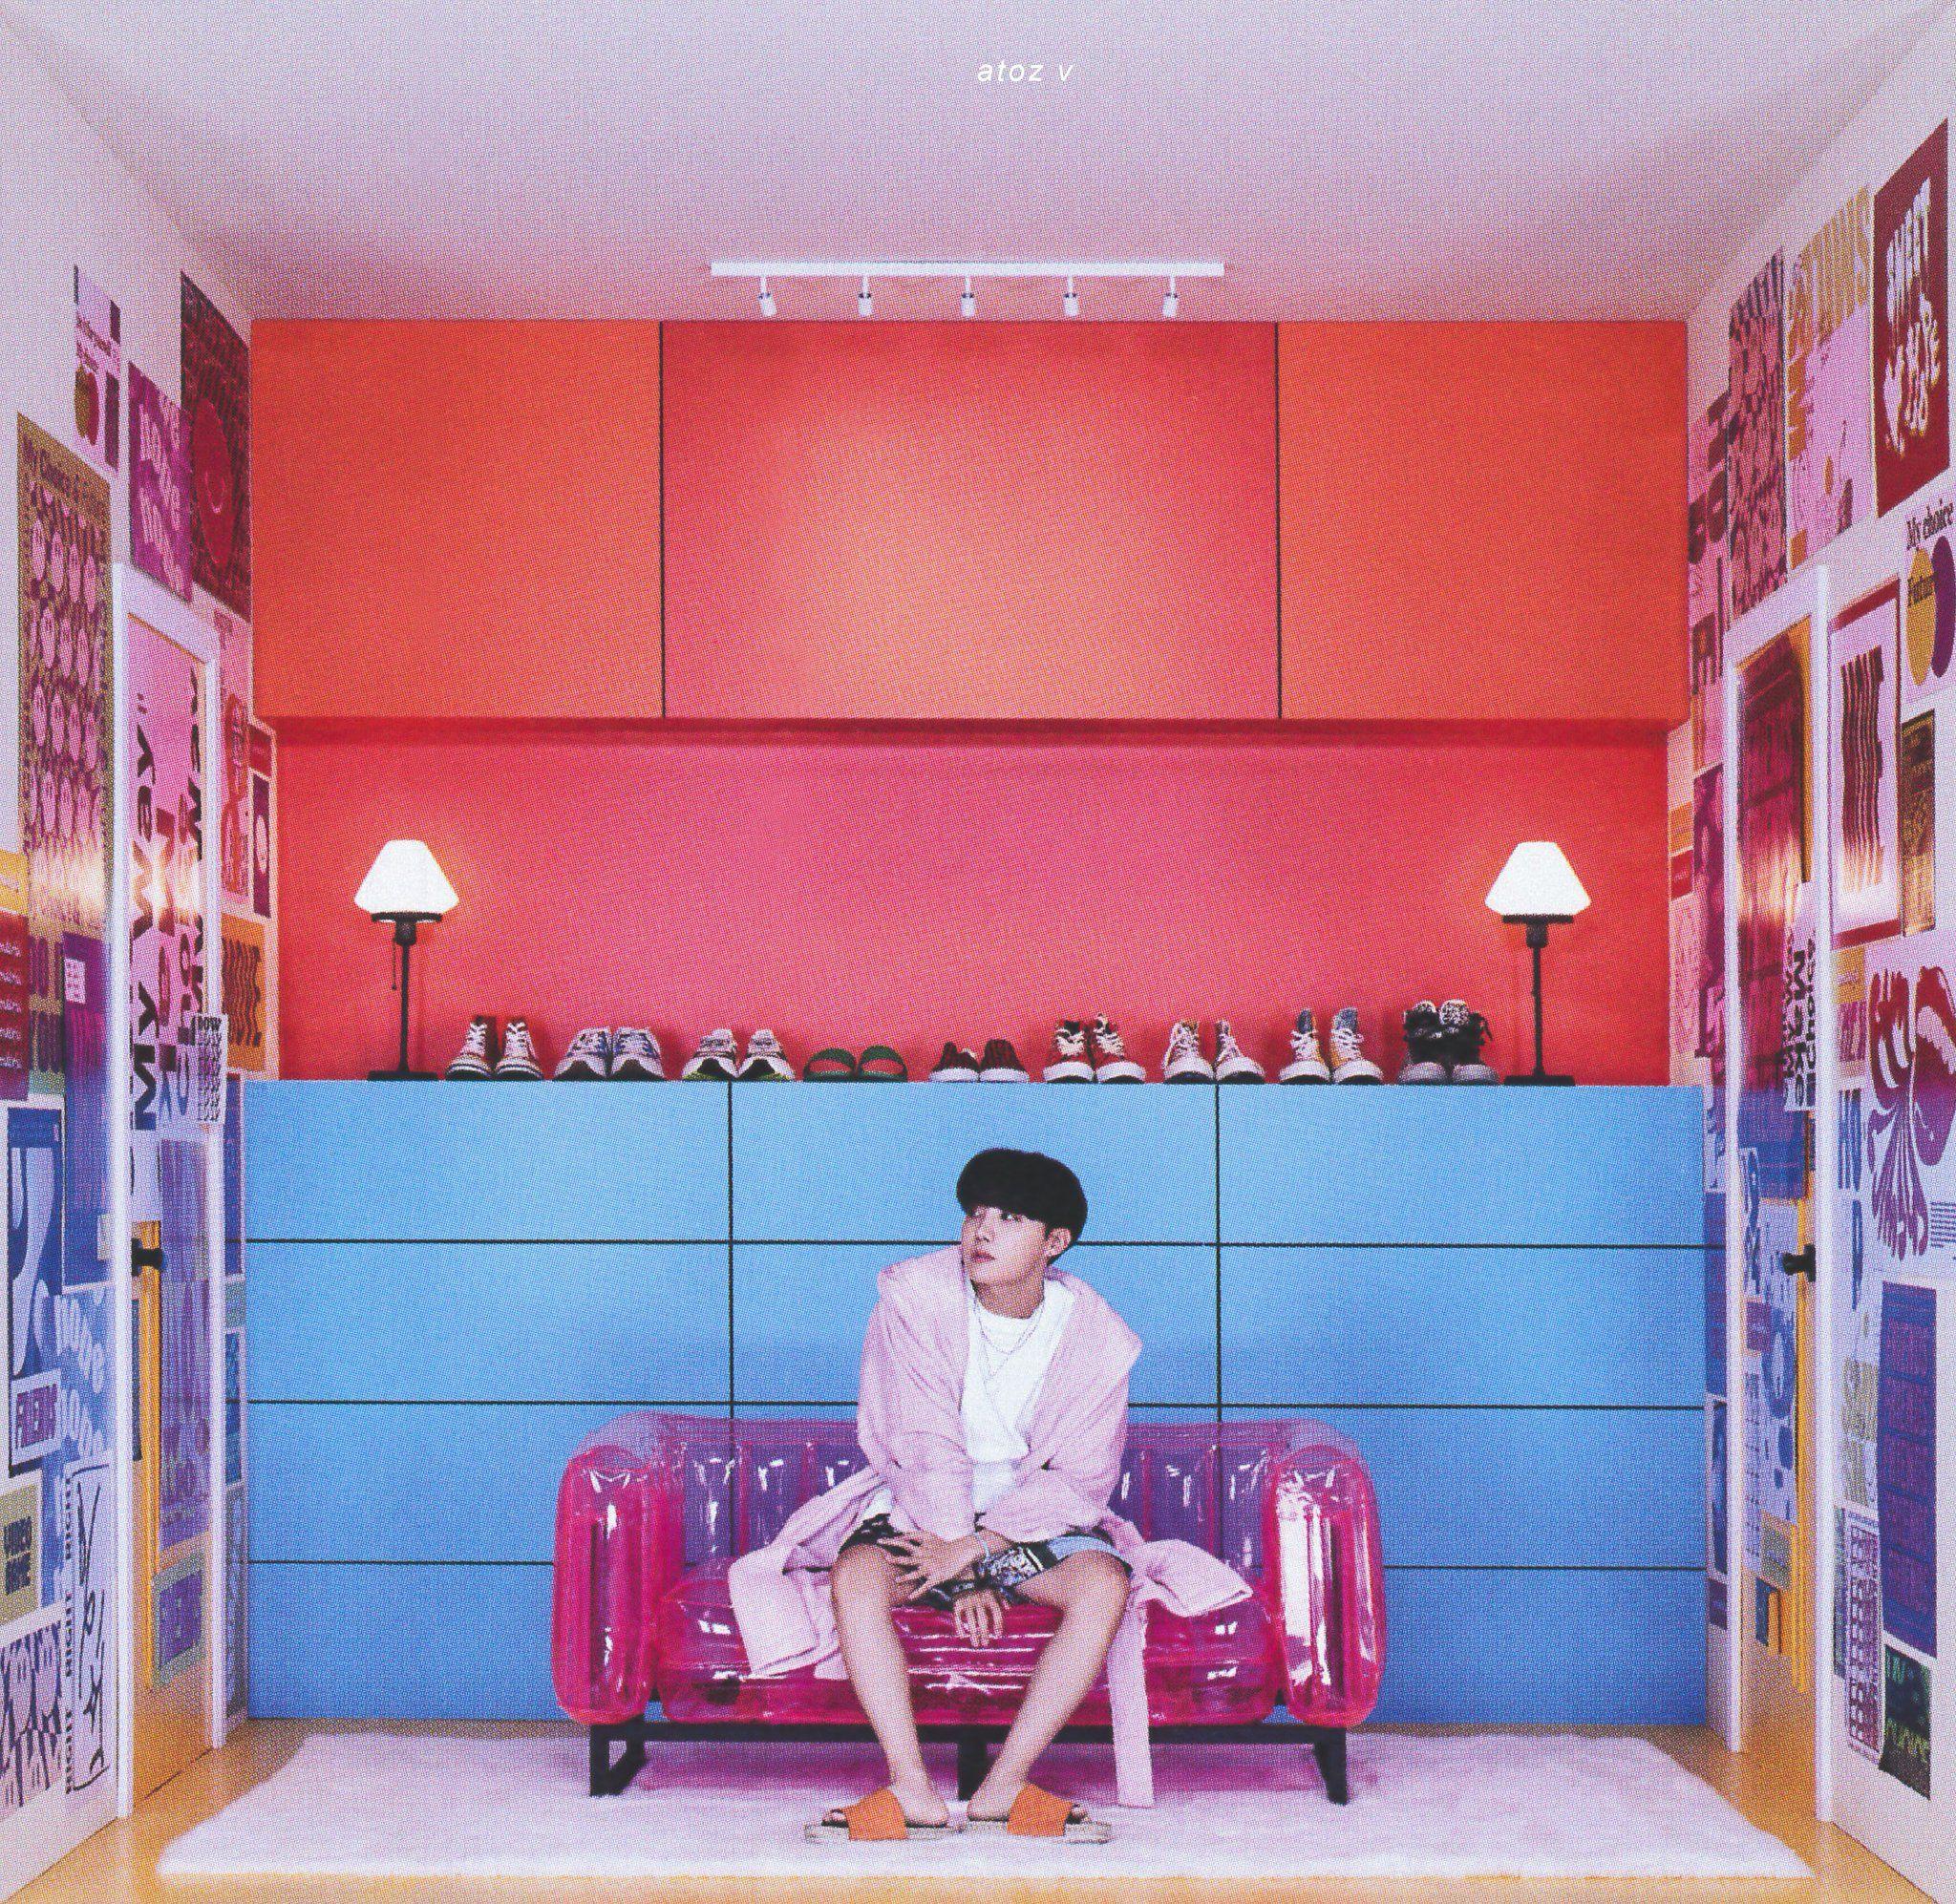 Atoz V On Twitter In 2021 Photo Room Home Decor Loft Bed Luxury bts room photo